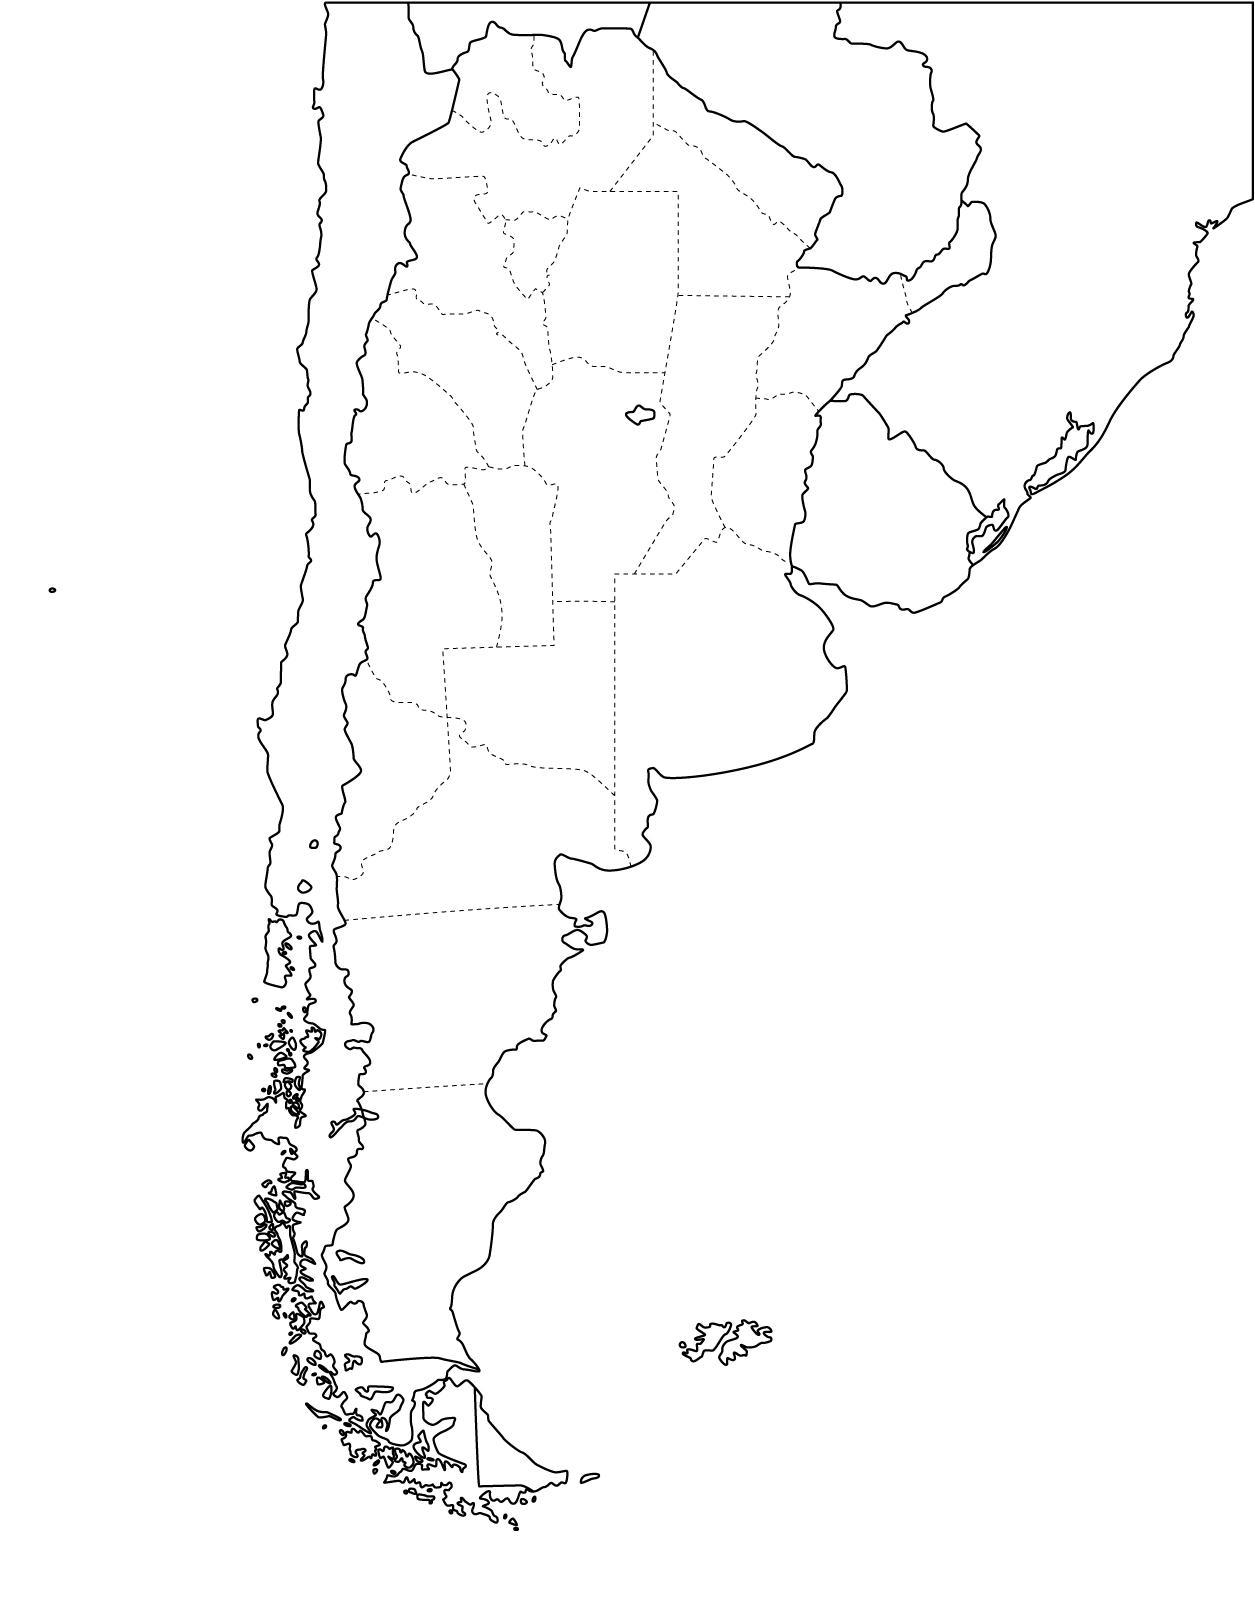 1255x1600 Resultado De Imagen De Mapa Argentina Politico Tatoo Colibri